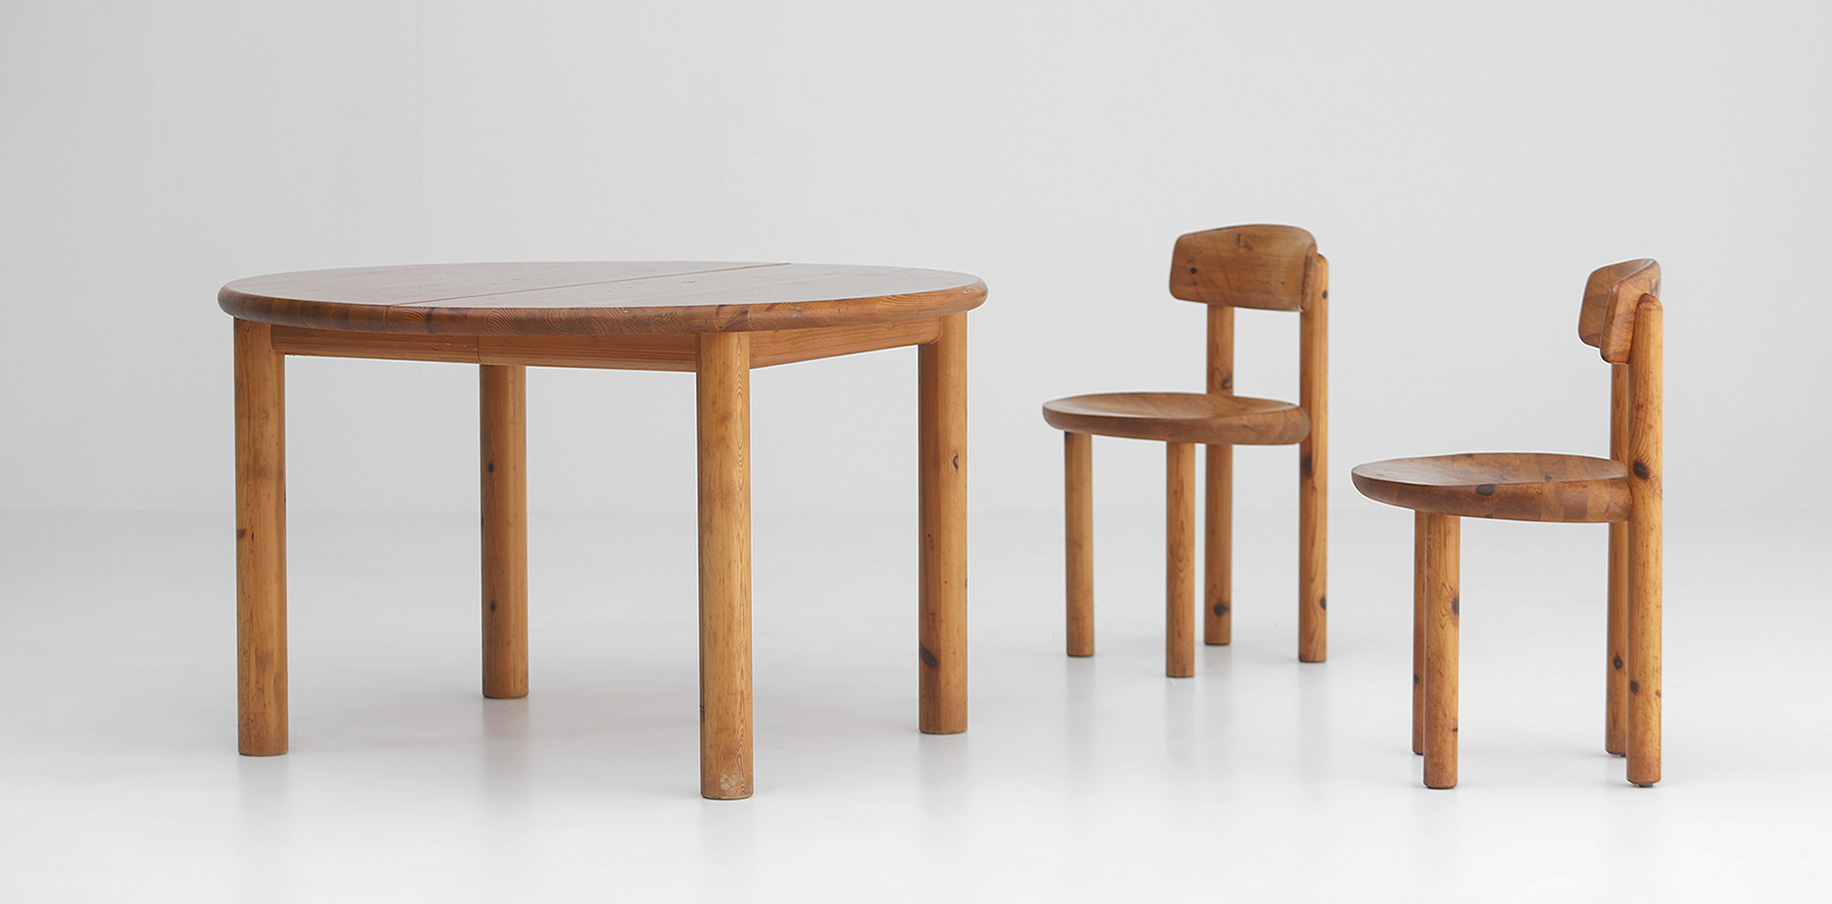 City furniture highlight 4